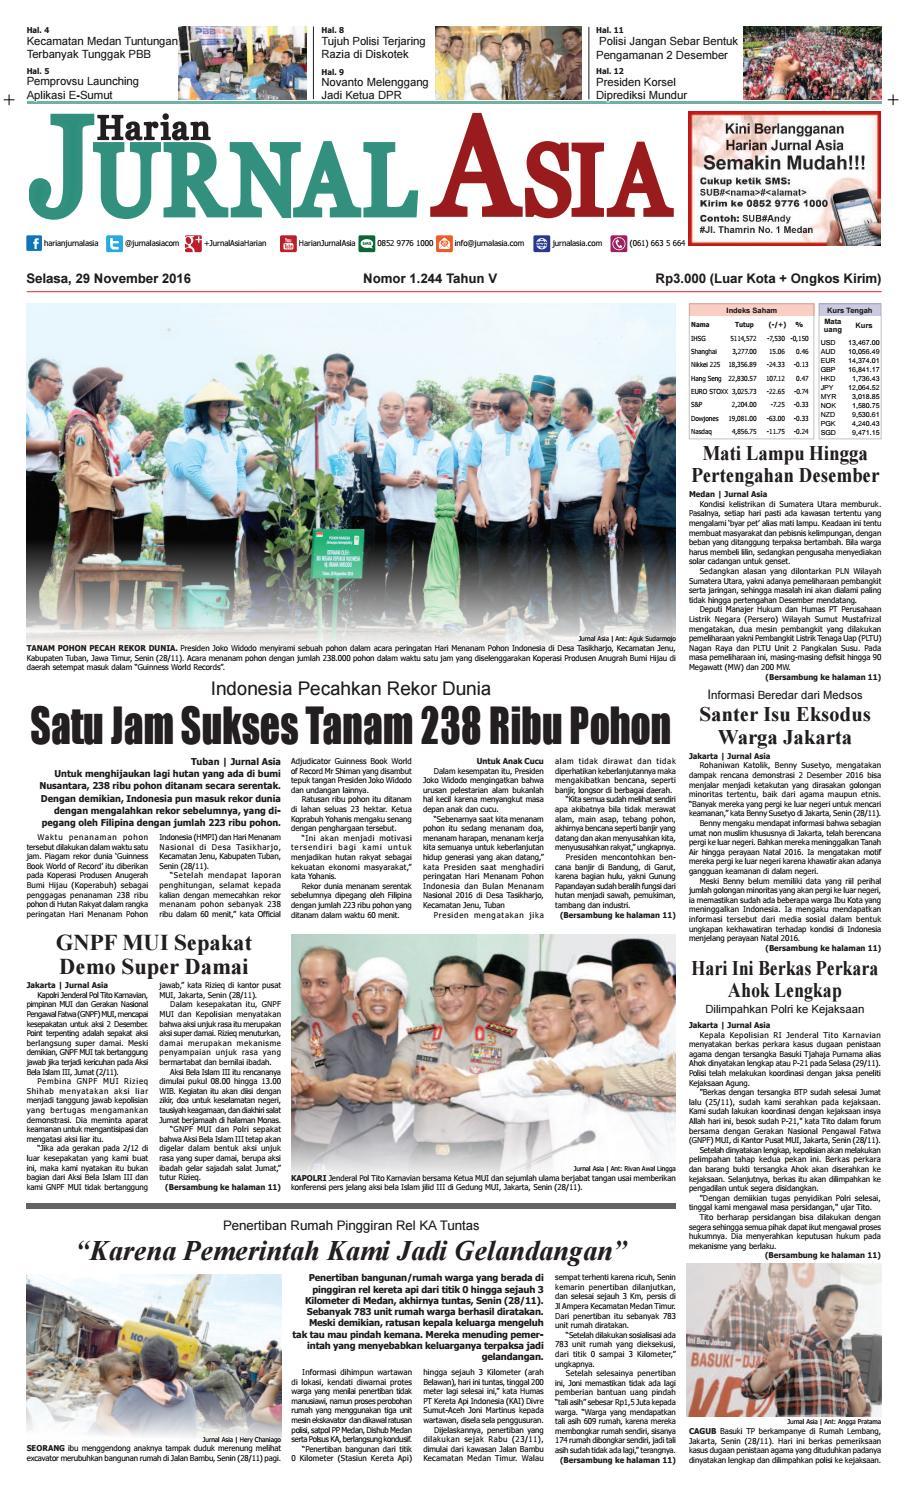 Harian Jurnal Asia Edisi Selasa 29 November 2016 By Produk Ukm Bumn Bella Dan Balon Merah Medan Issuu